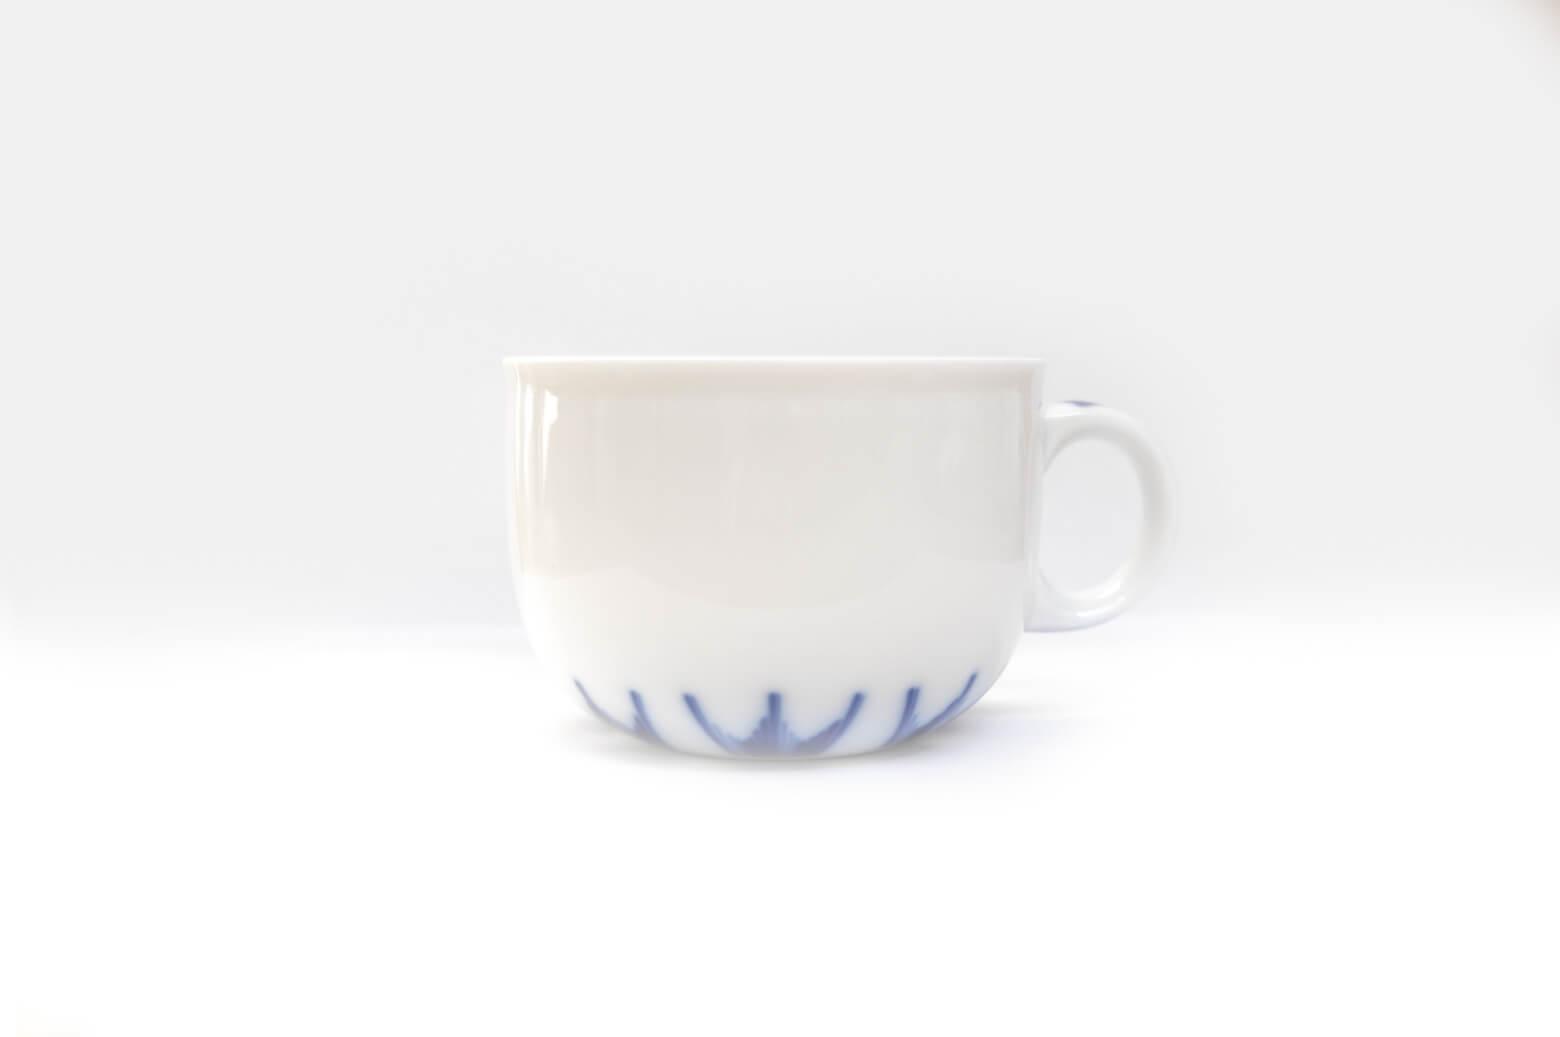 B&G Tea Pot and Cup Martin Hunt/ビングオーグレンダール ティーポット カップ セット マーティン・ハント デンマーク 北欧食器 ヴィンテージ 1